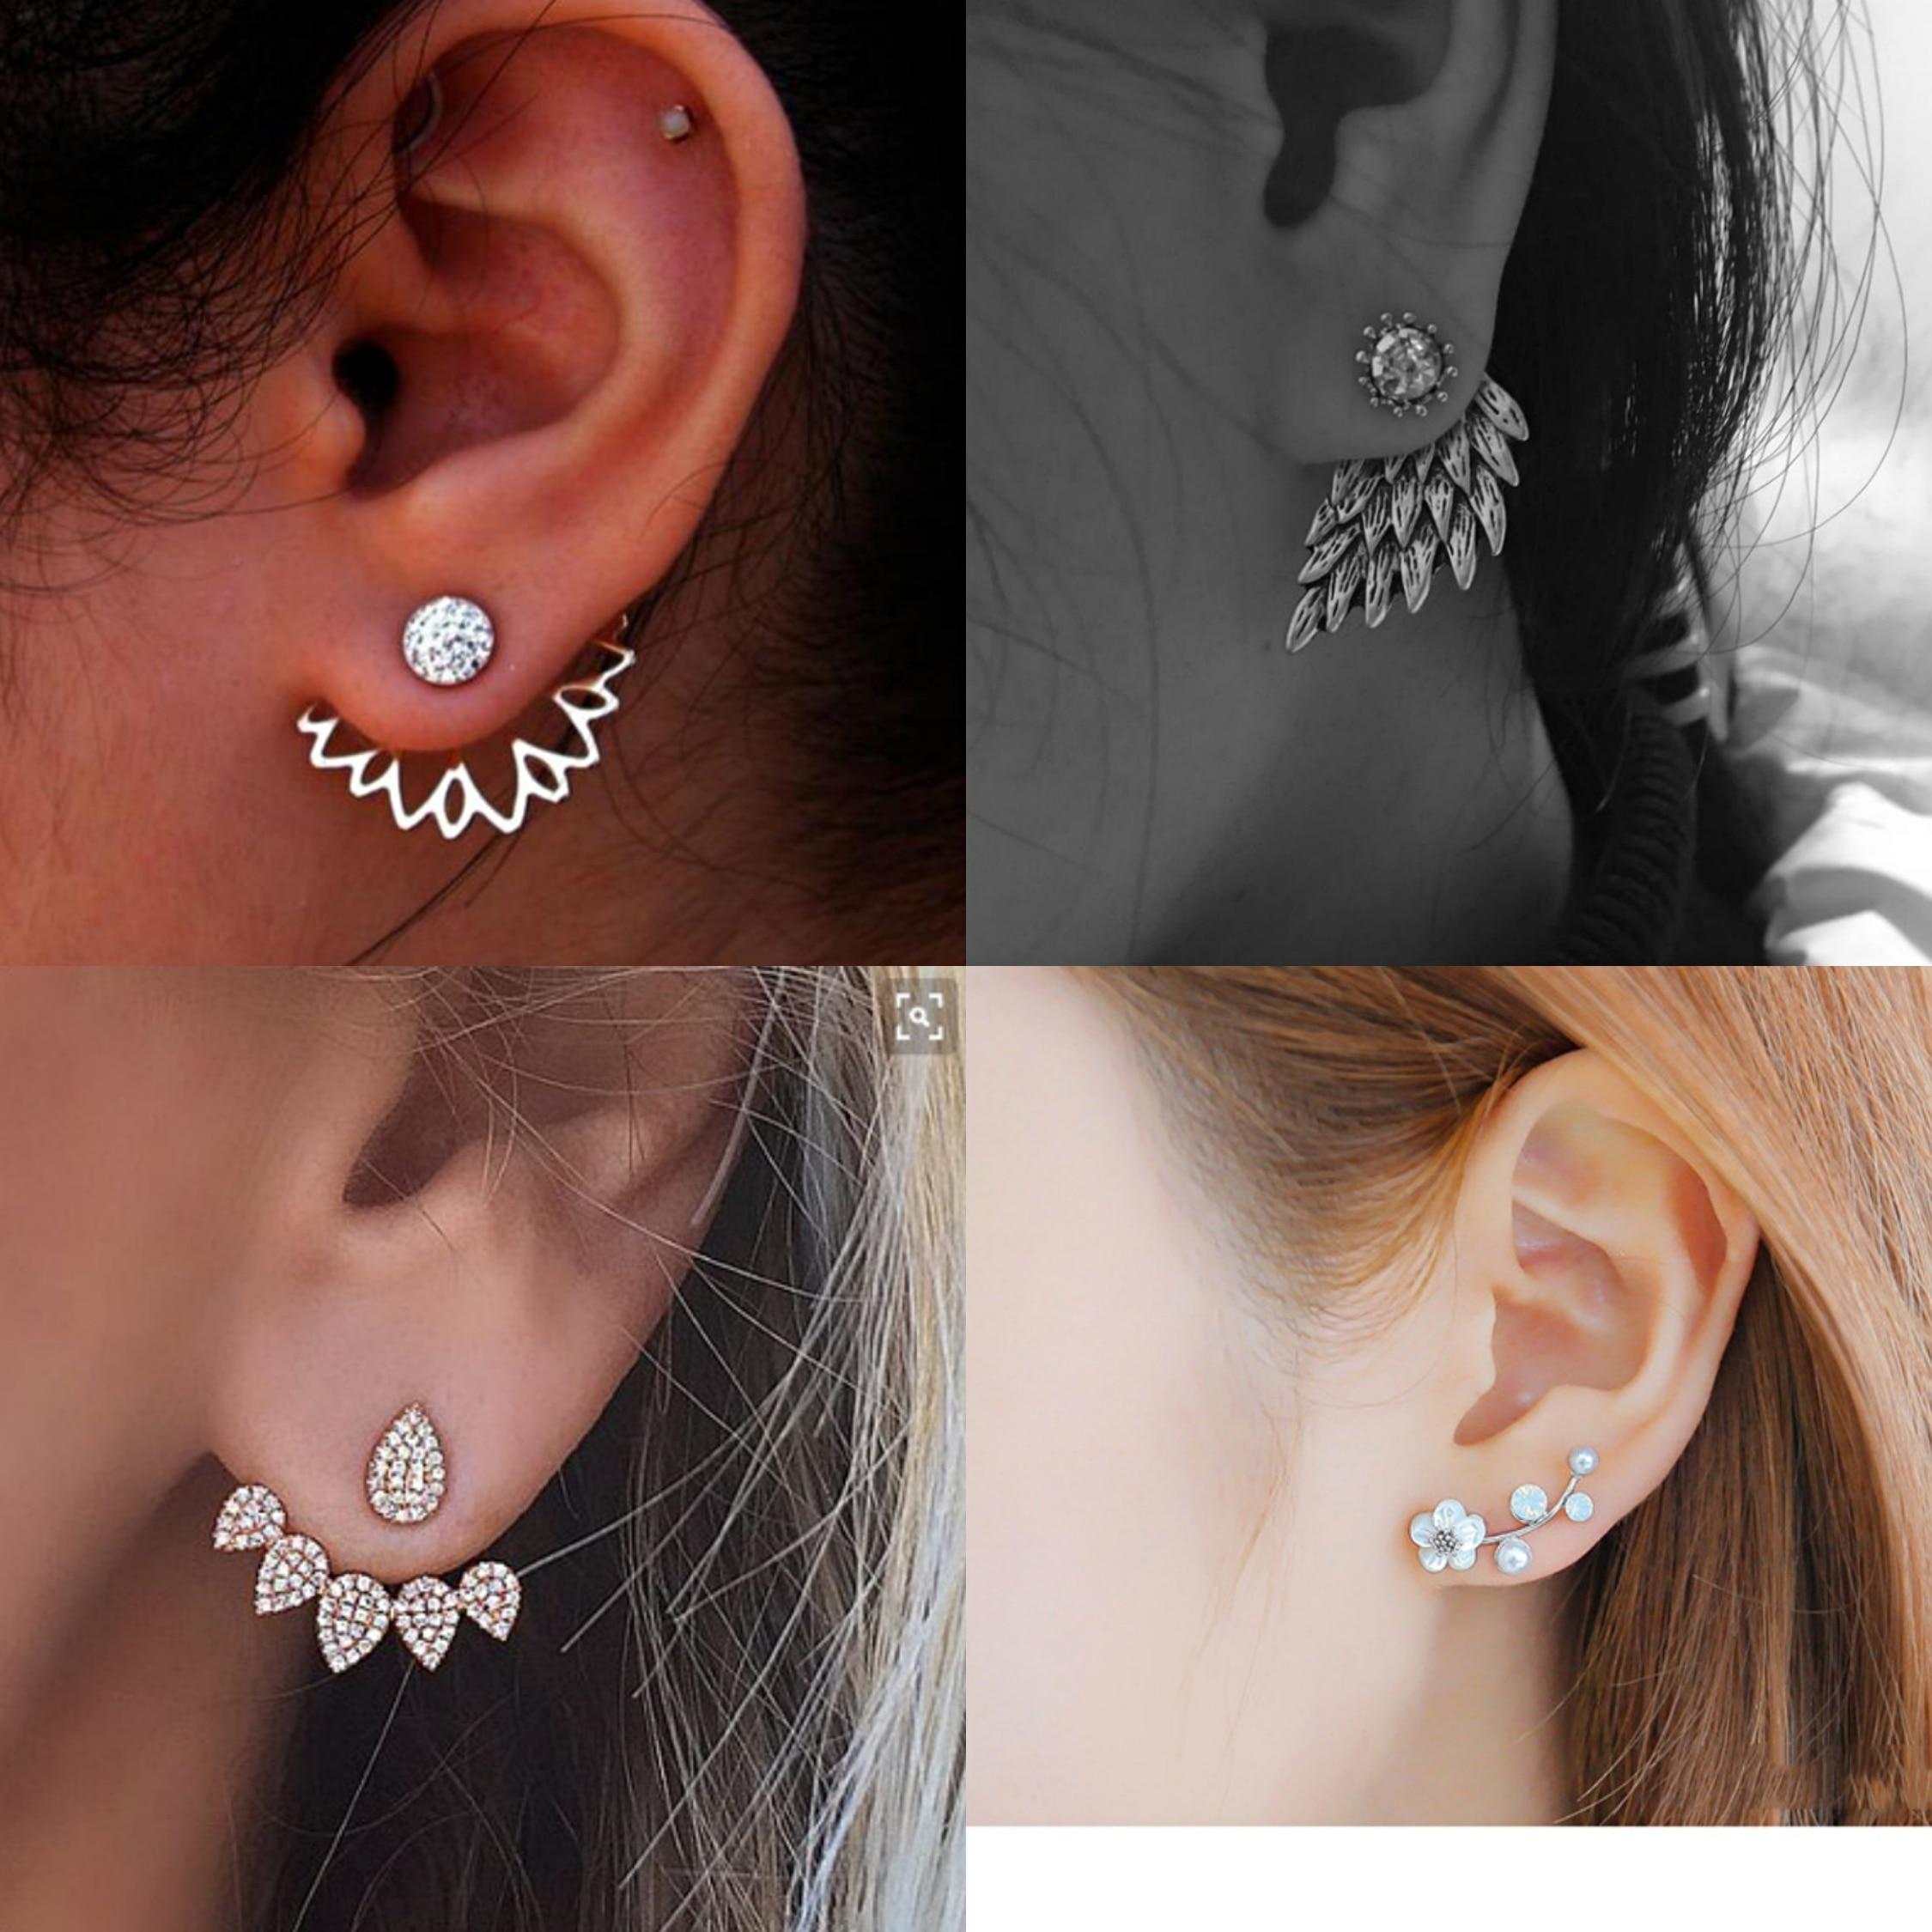 2019 New Crystal Flower Drop Earrings For Women Fashion Jewelry Gold Silver Rhinestones Earrings Gift For Party Best Friend